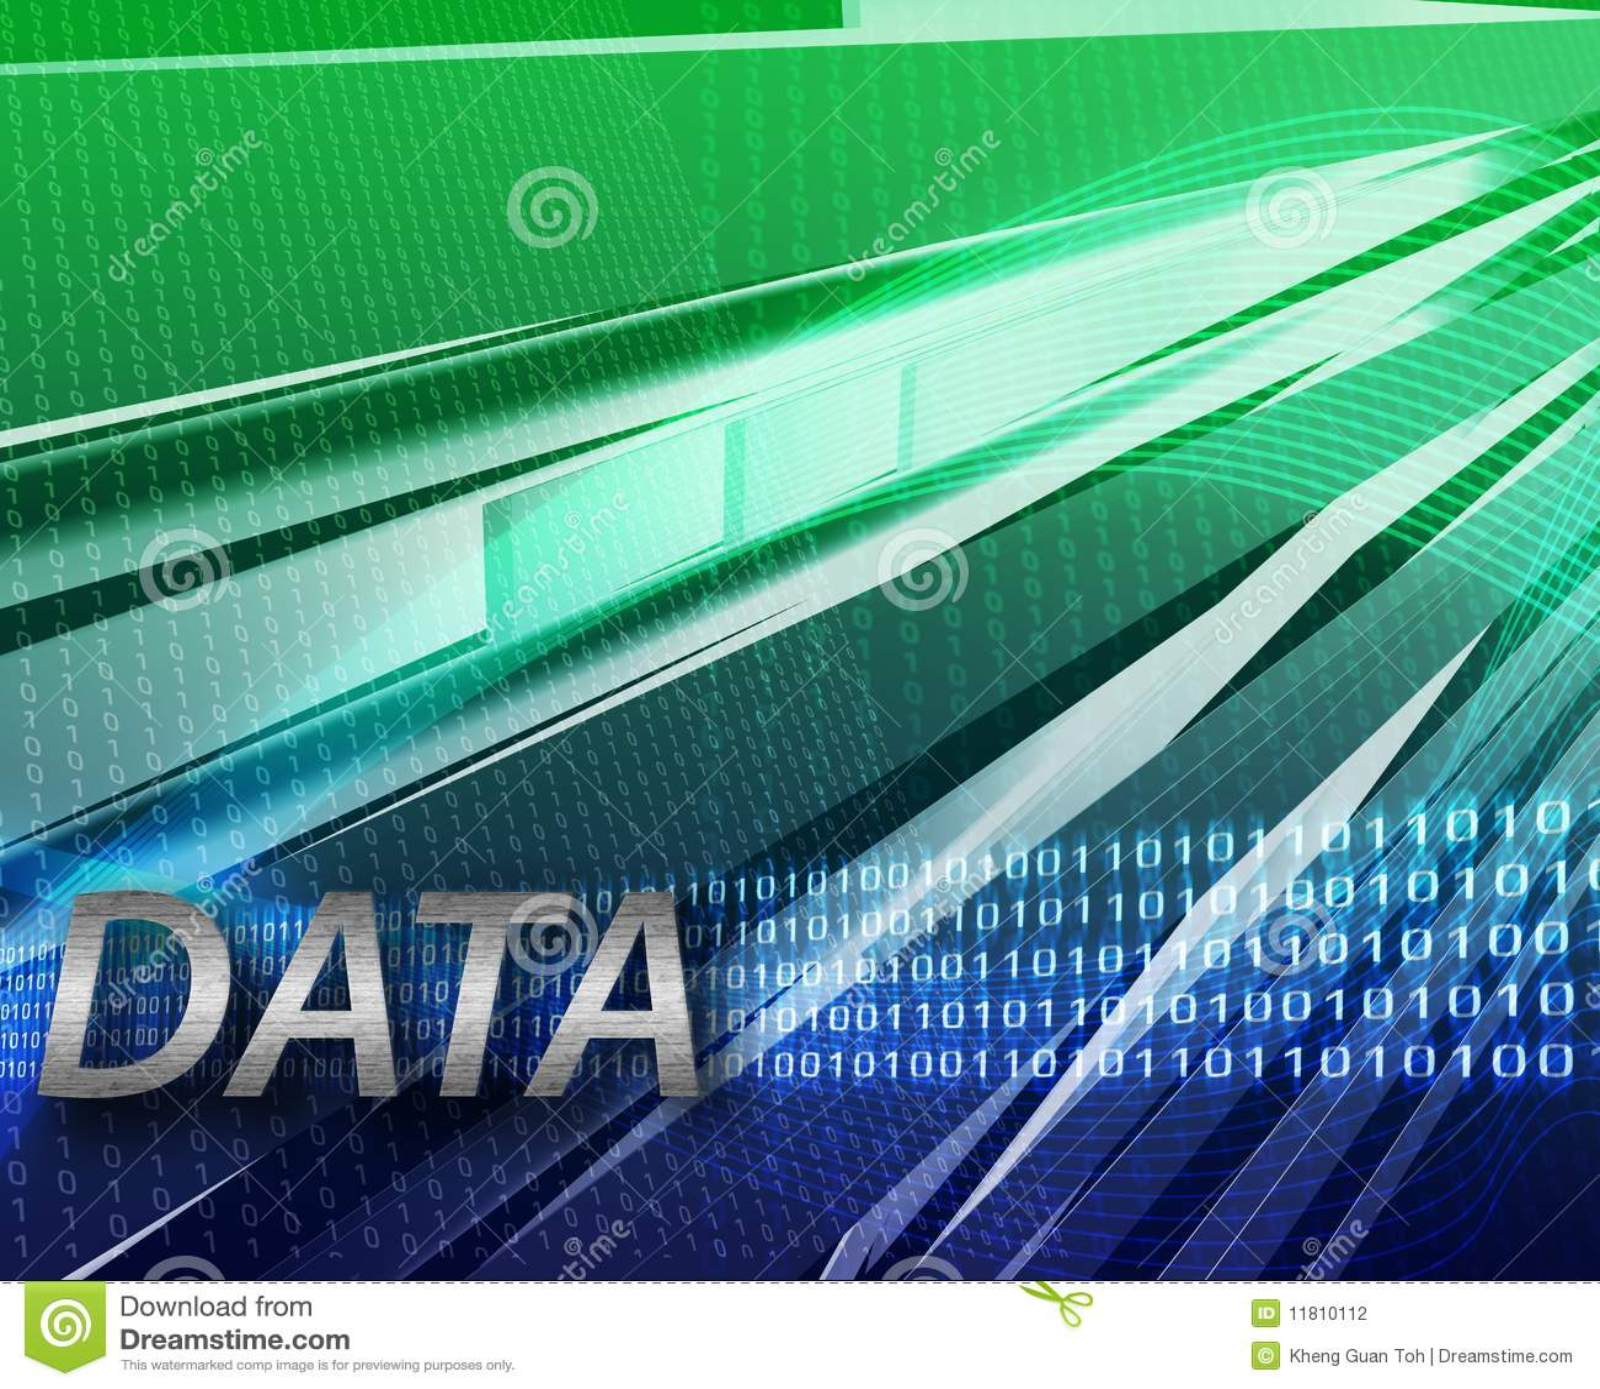 data internet: